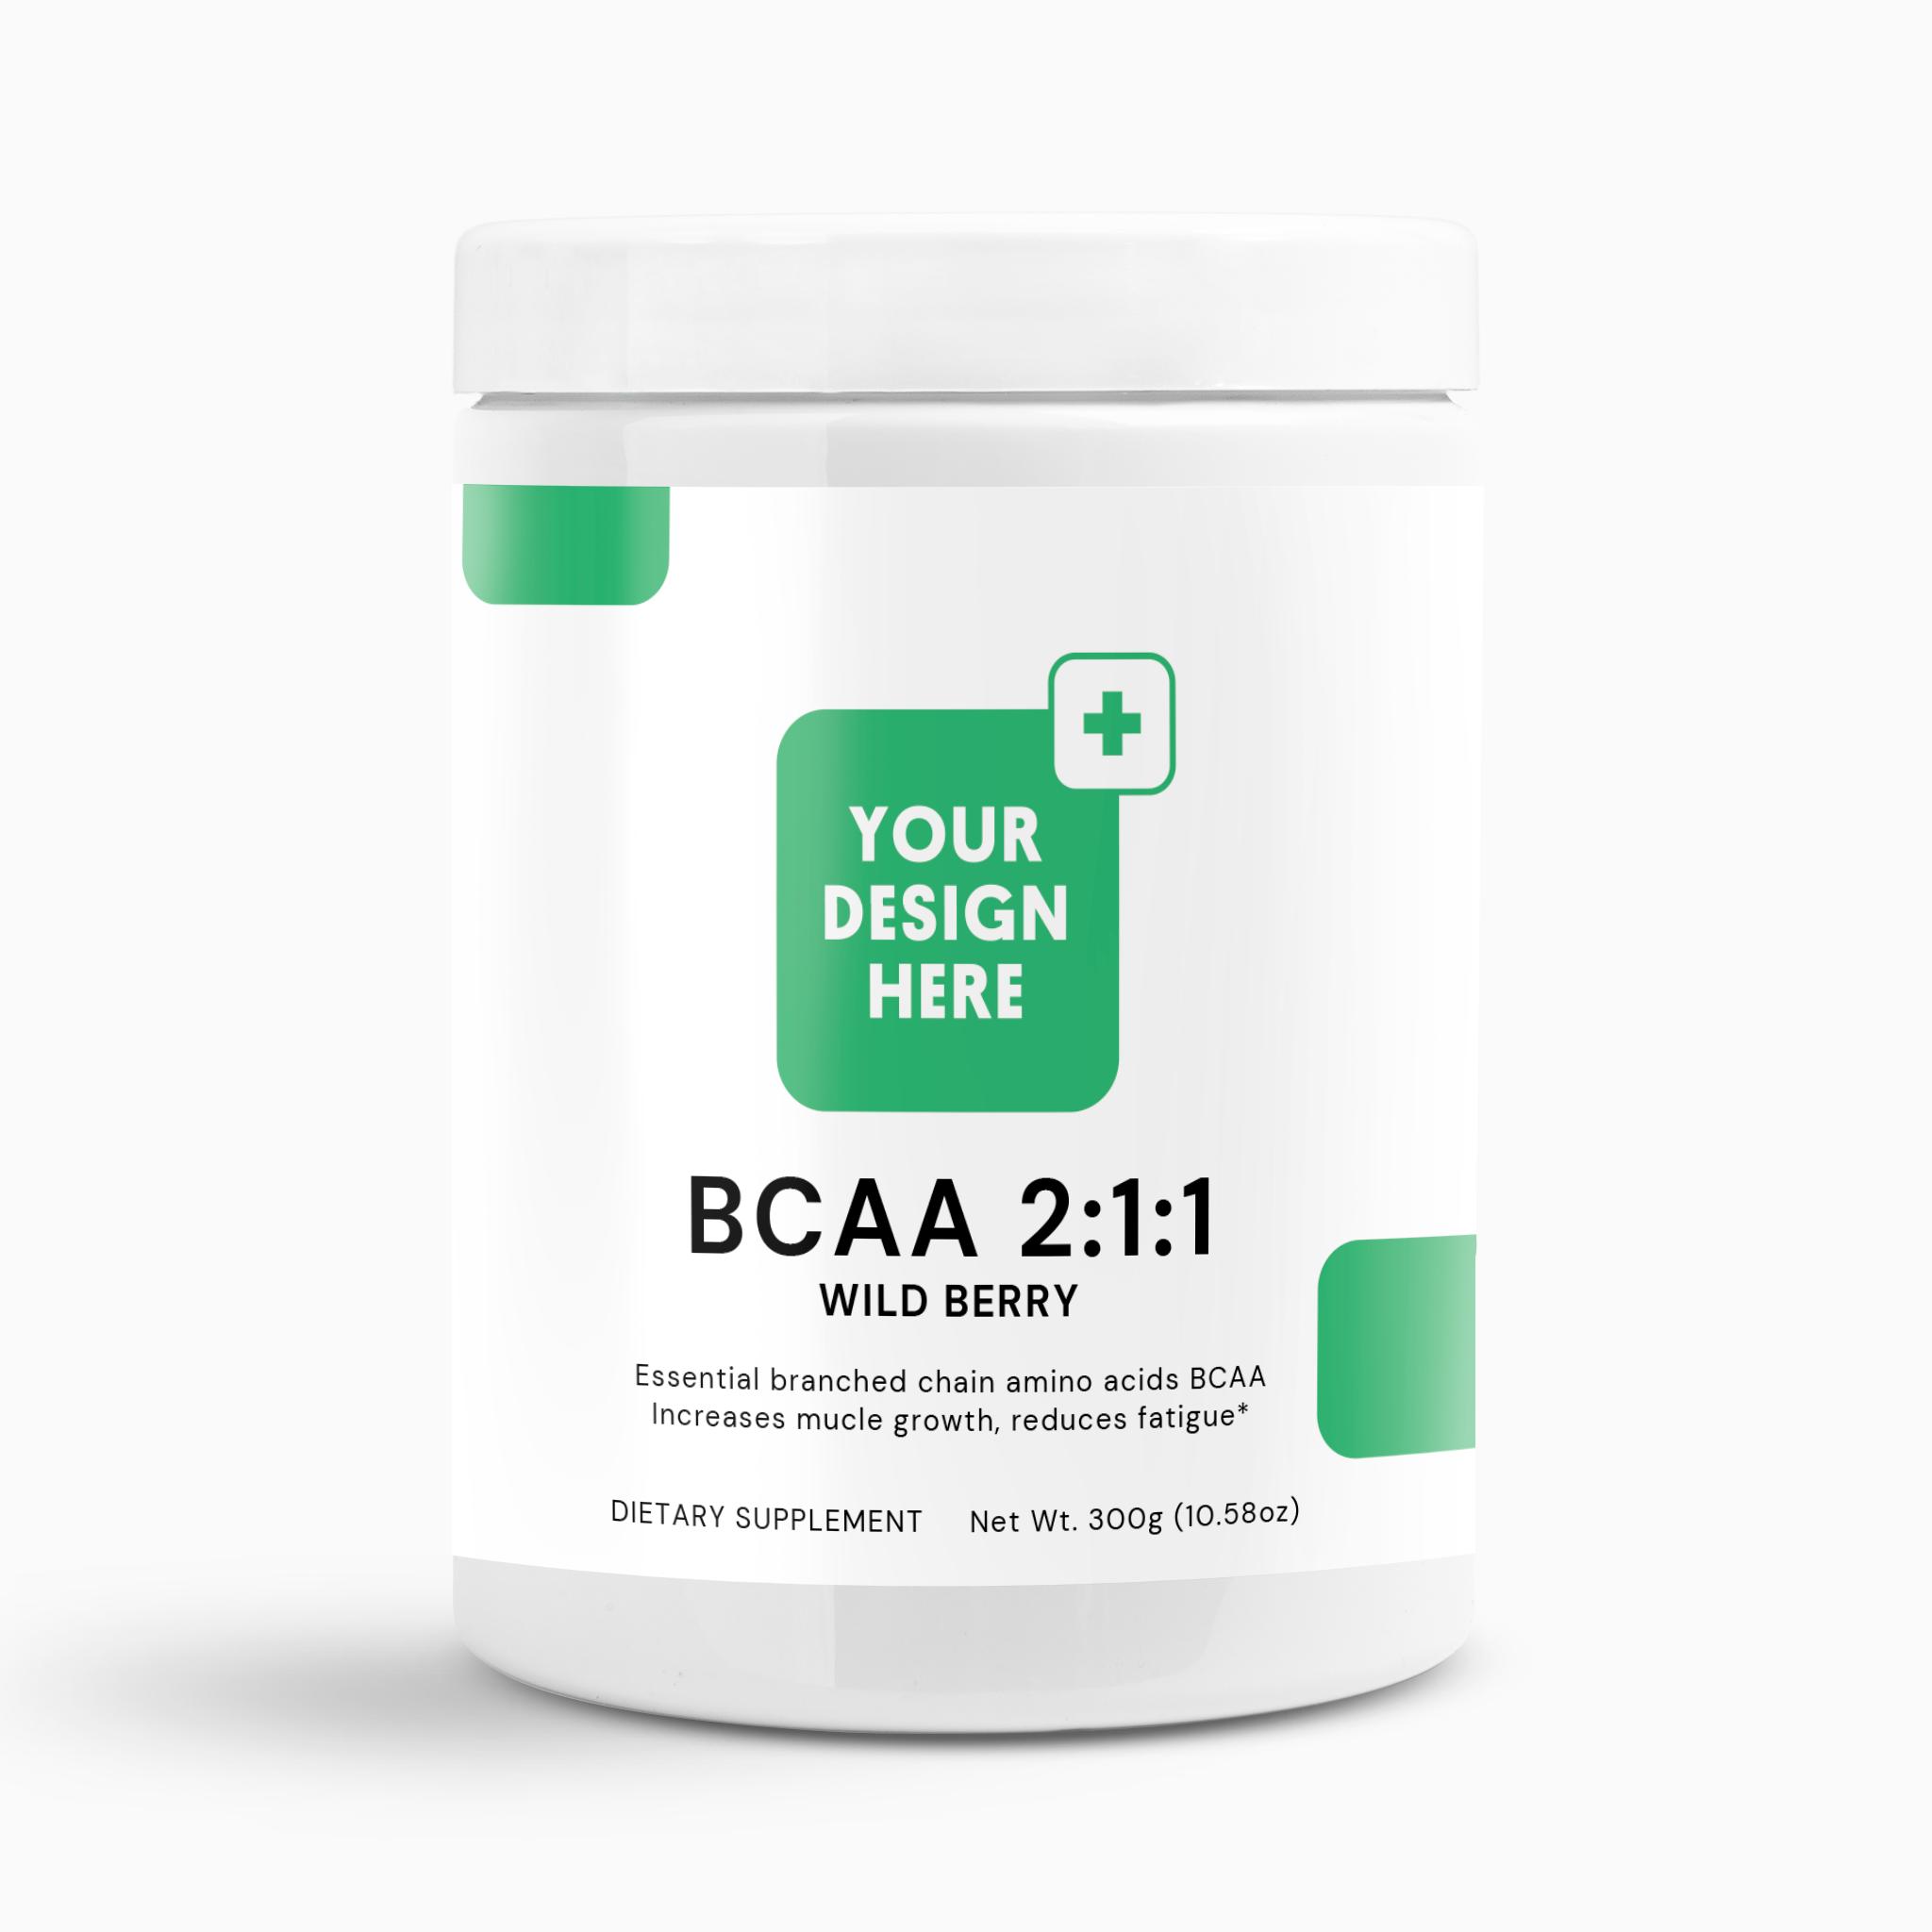 BCAA 2:1:1